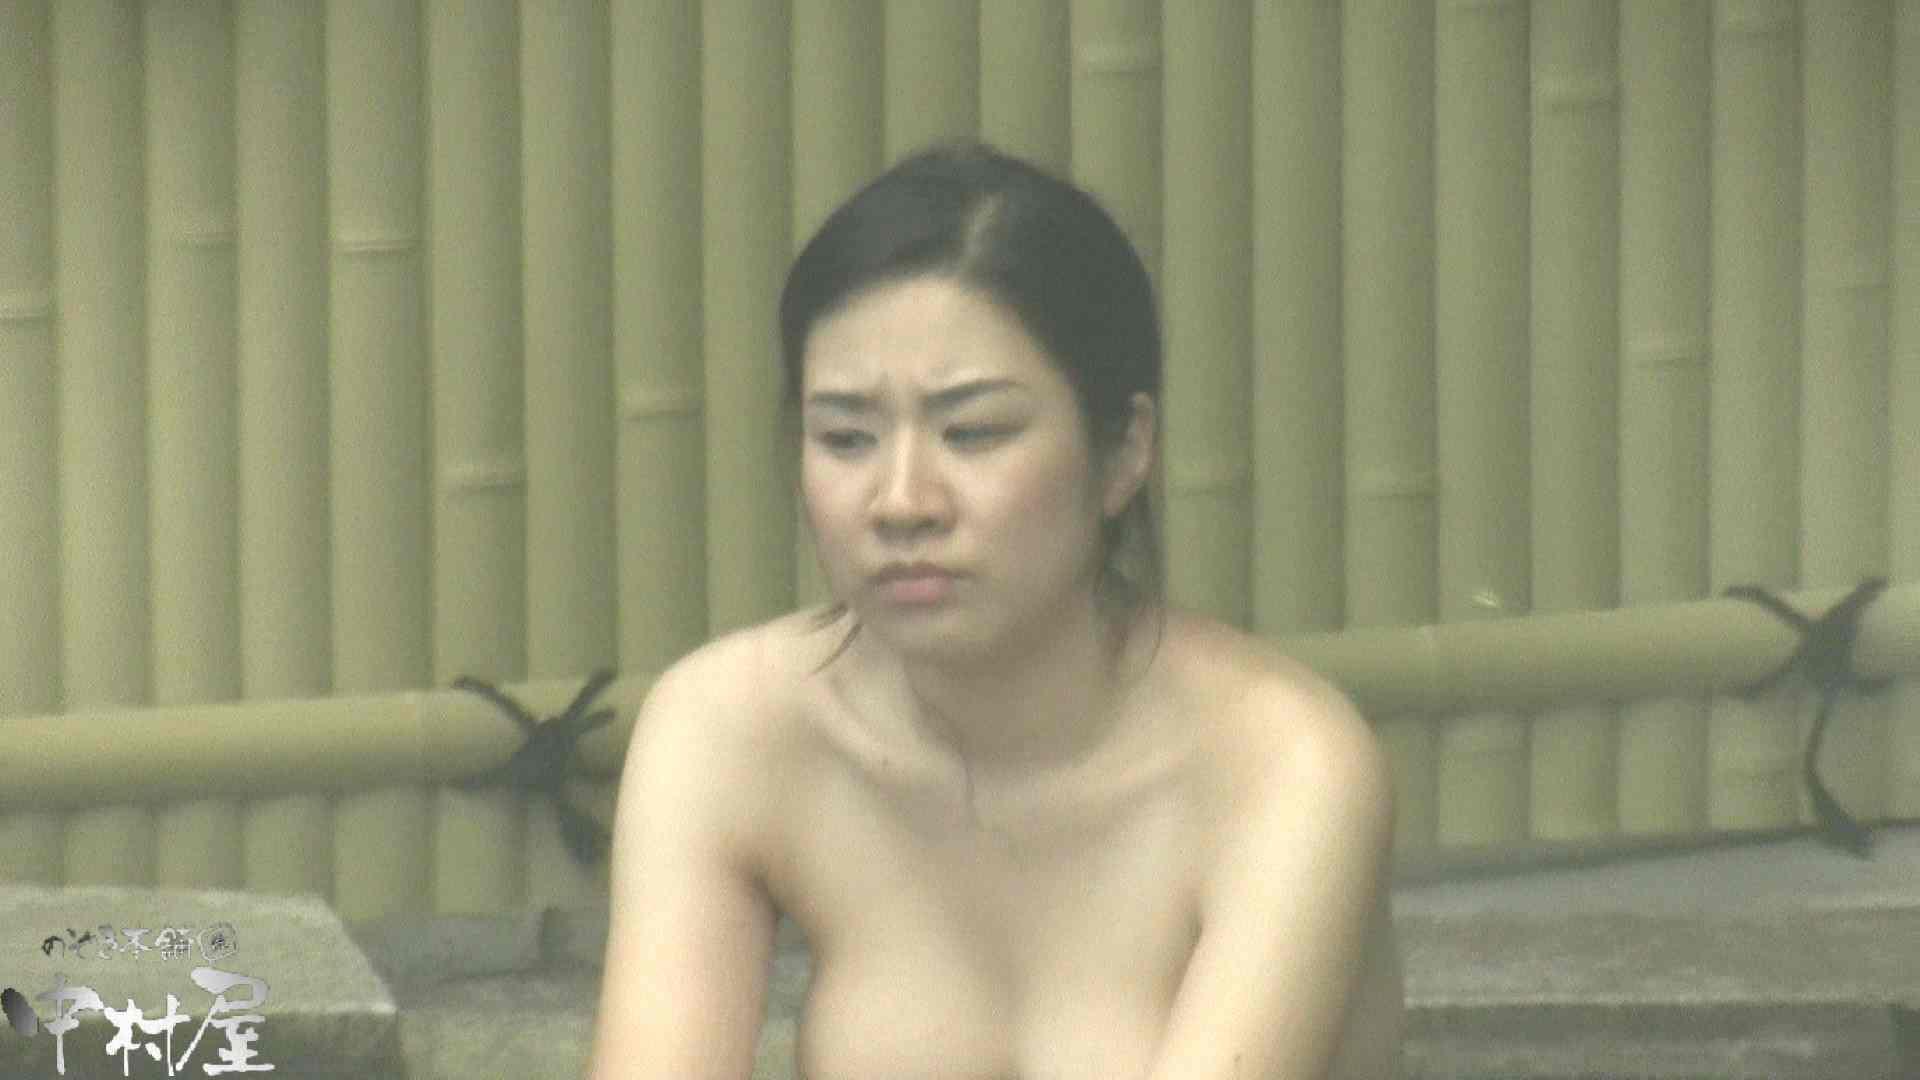 Aquaな露天風呂Vol.913 OLのエロ生活 すけべAV動画紹介 68連発 26